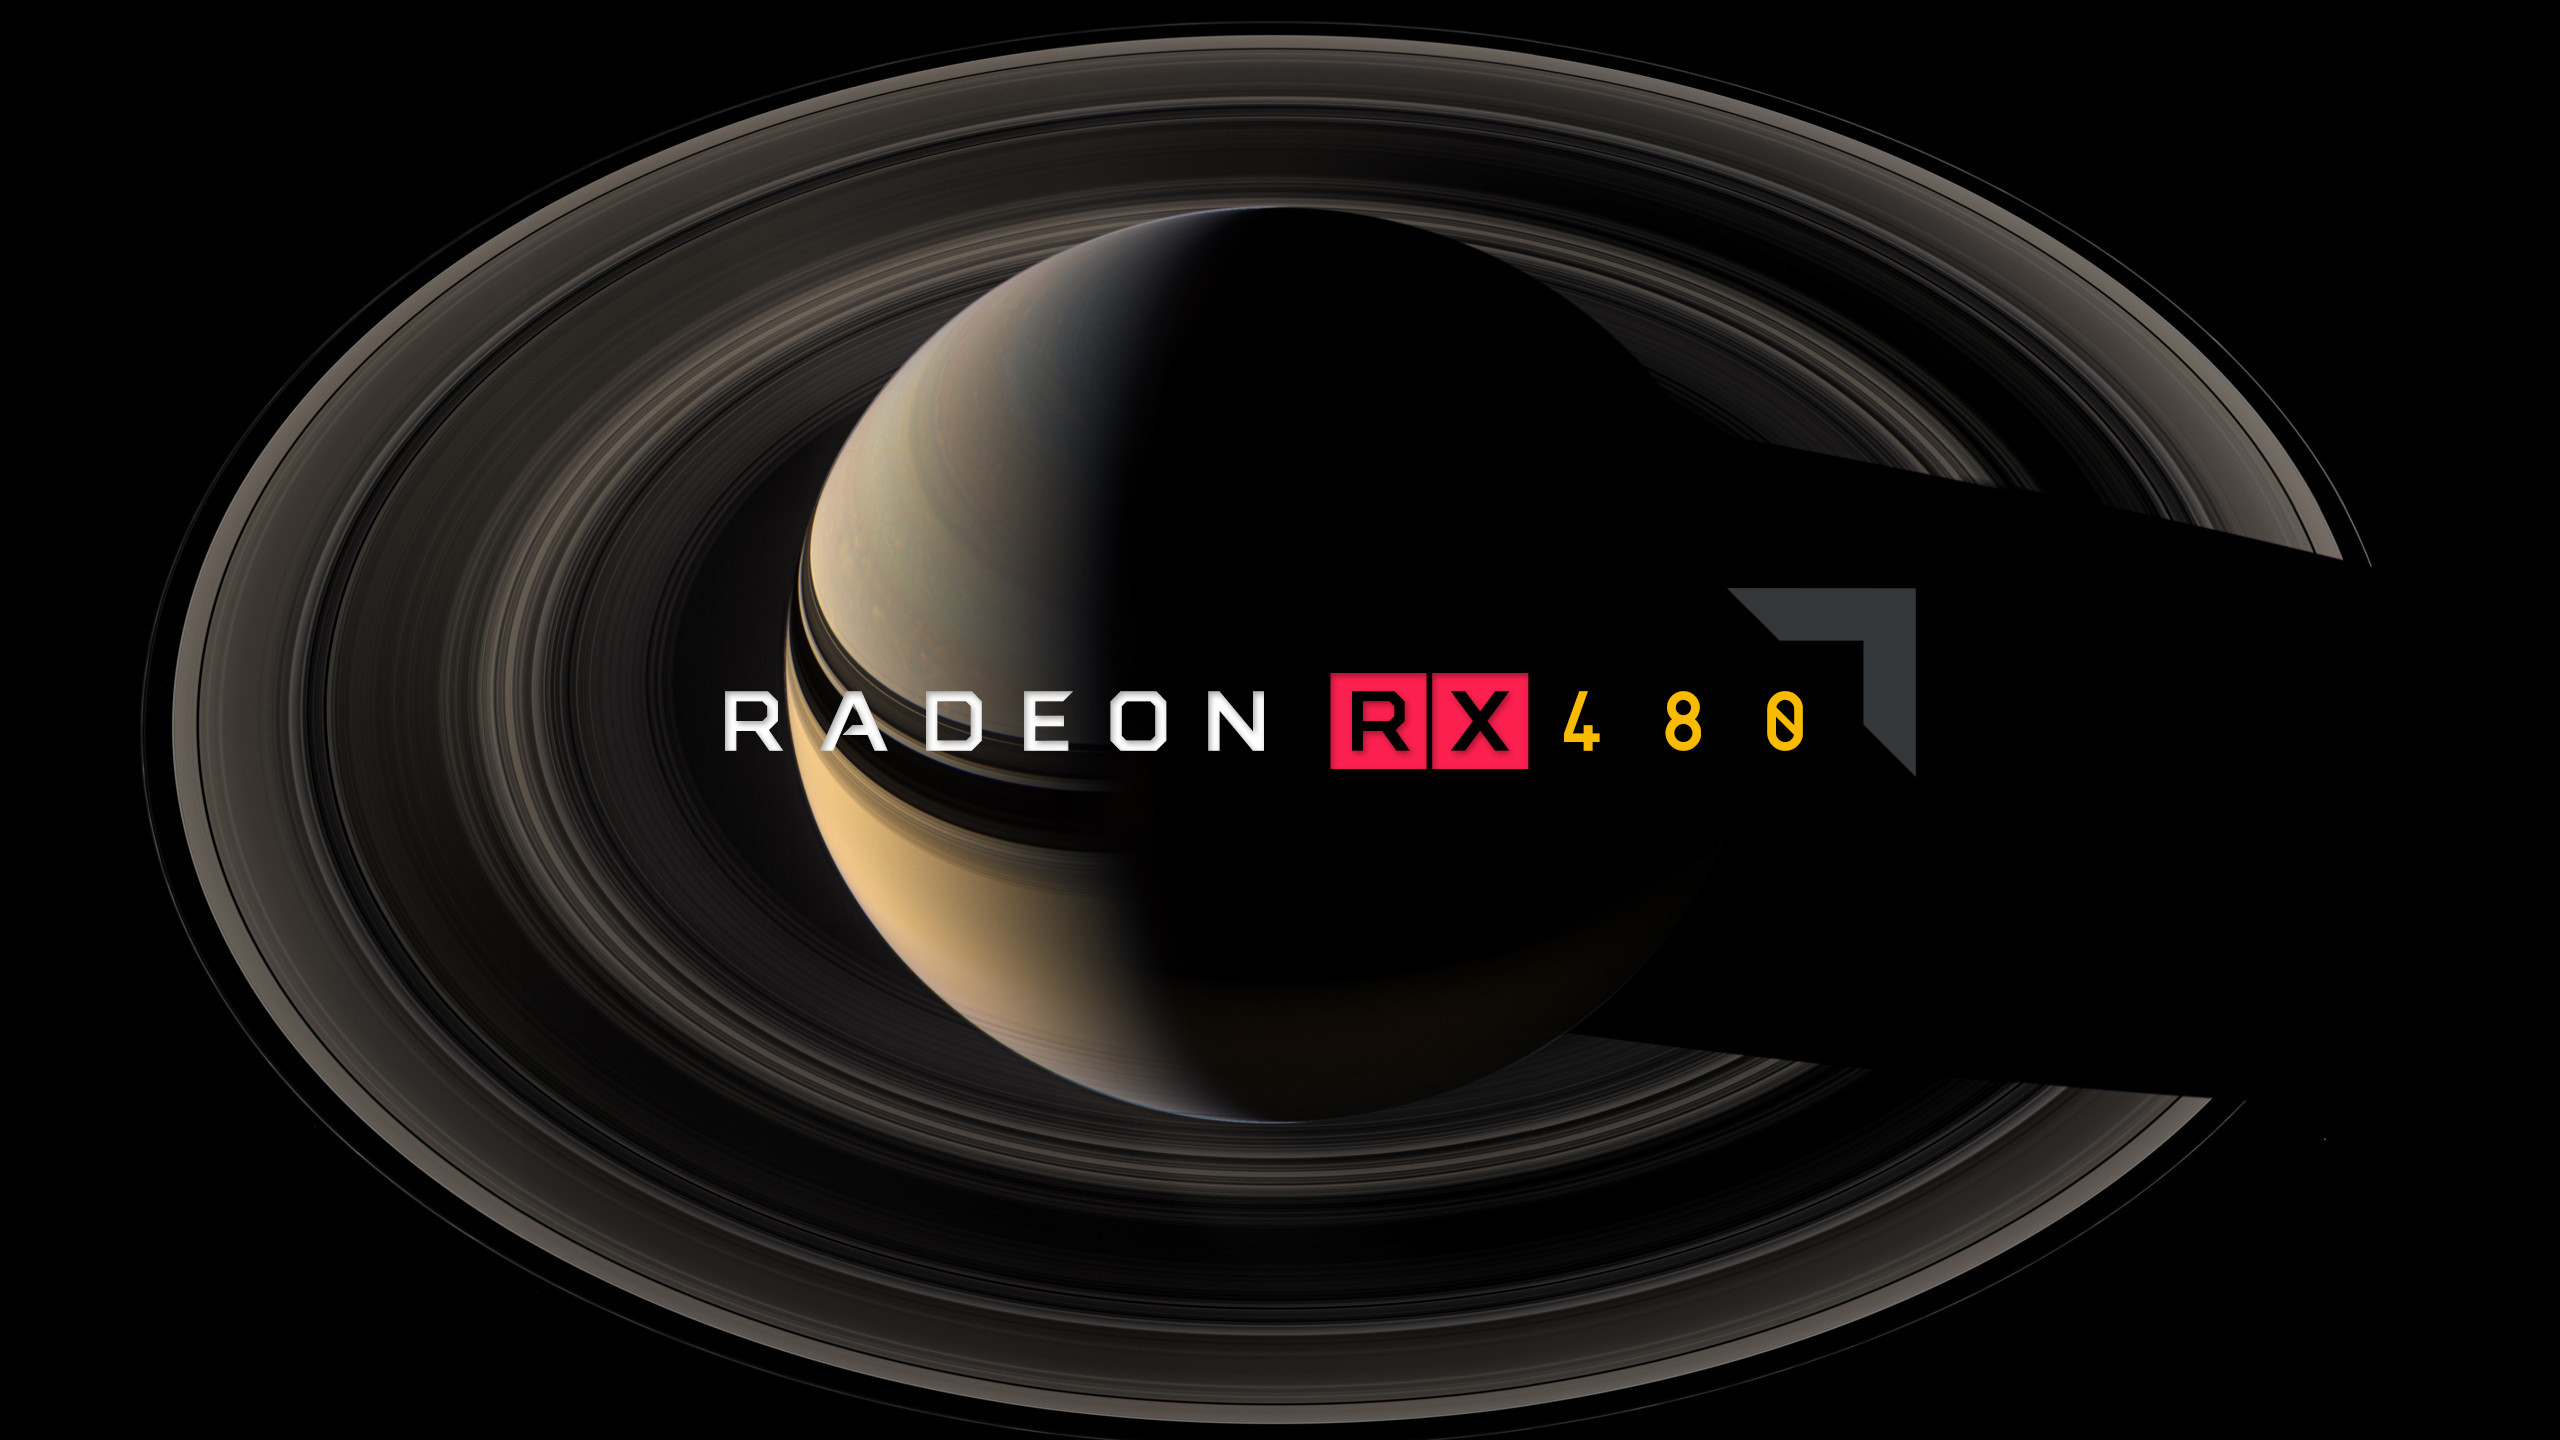 R9 390x 4K tangclown Edition